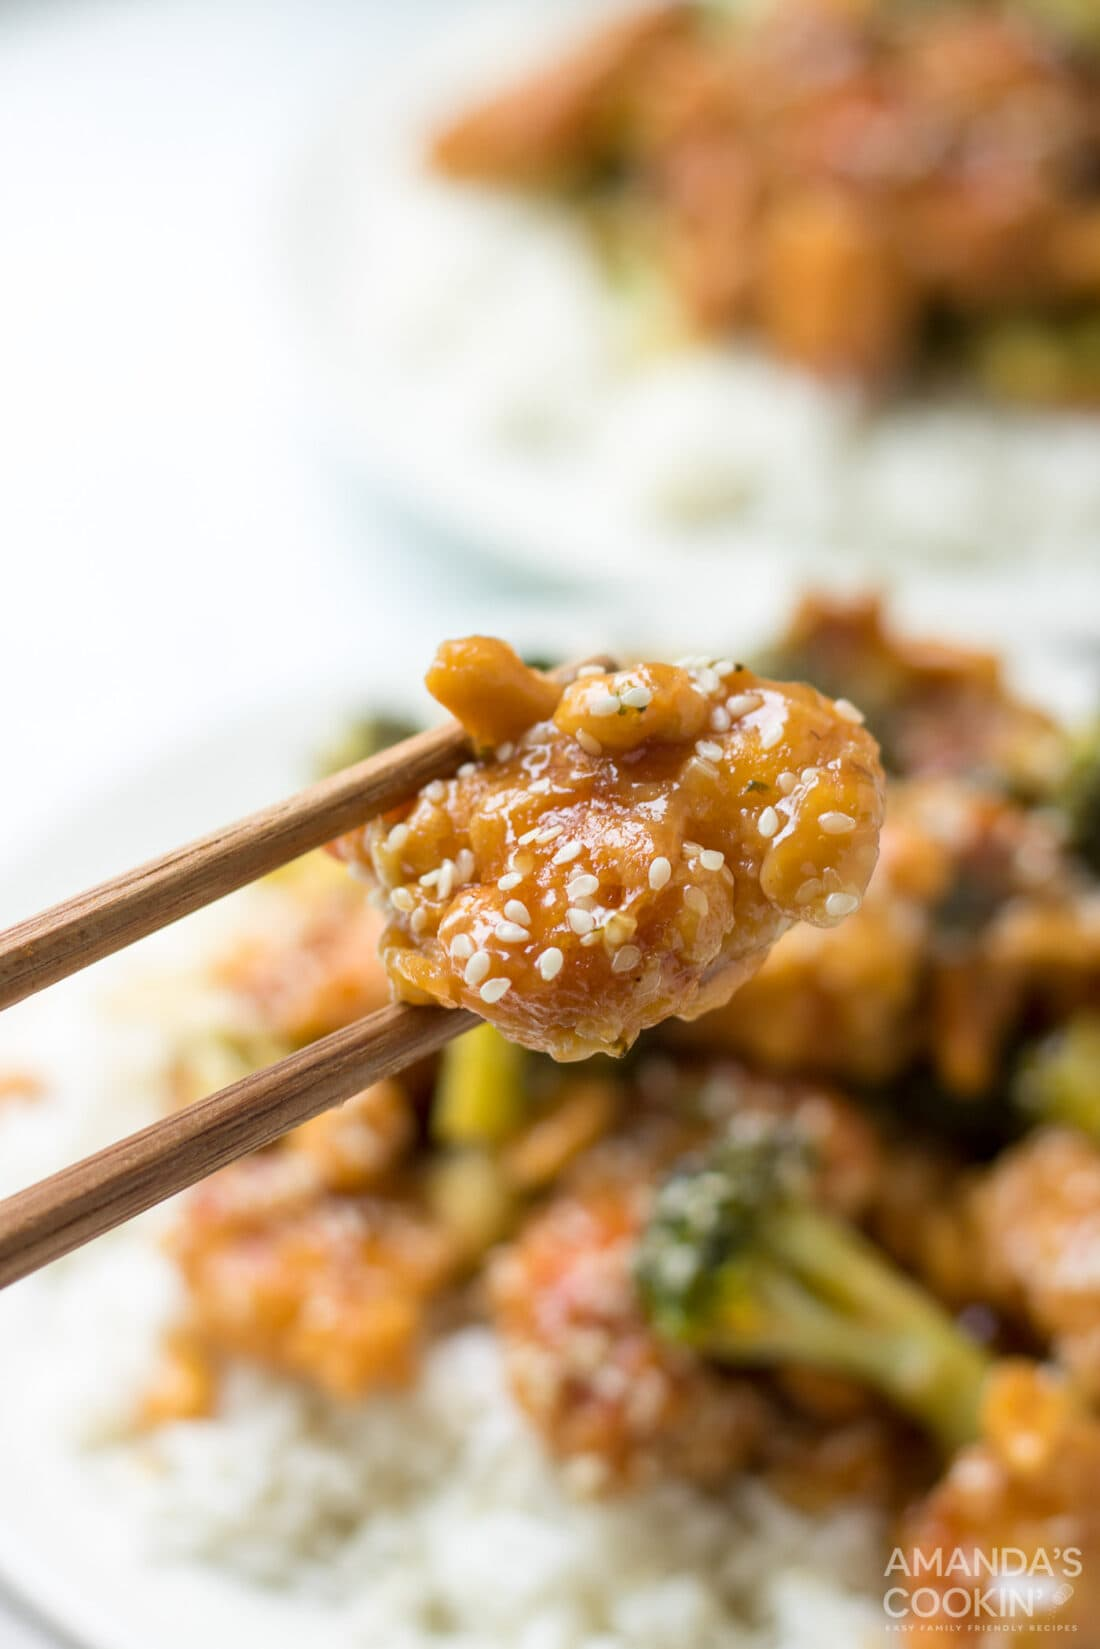 chopstick holding sesame chicken